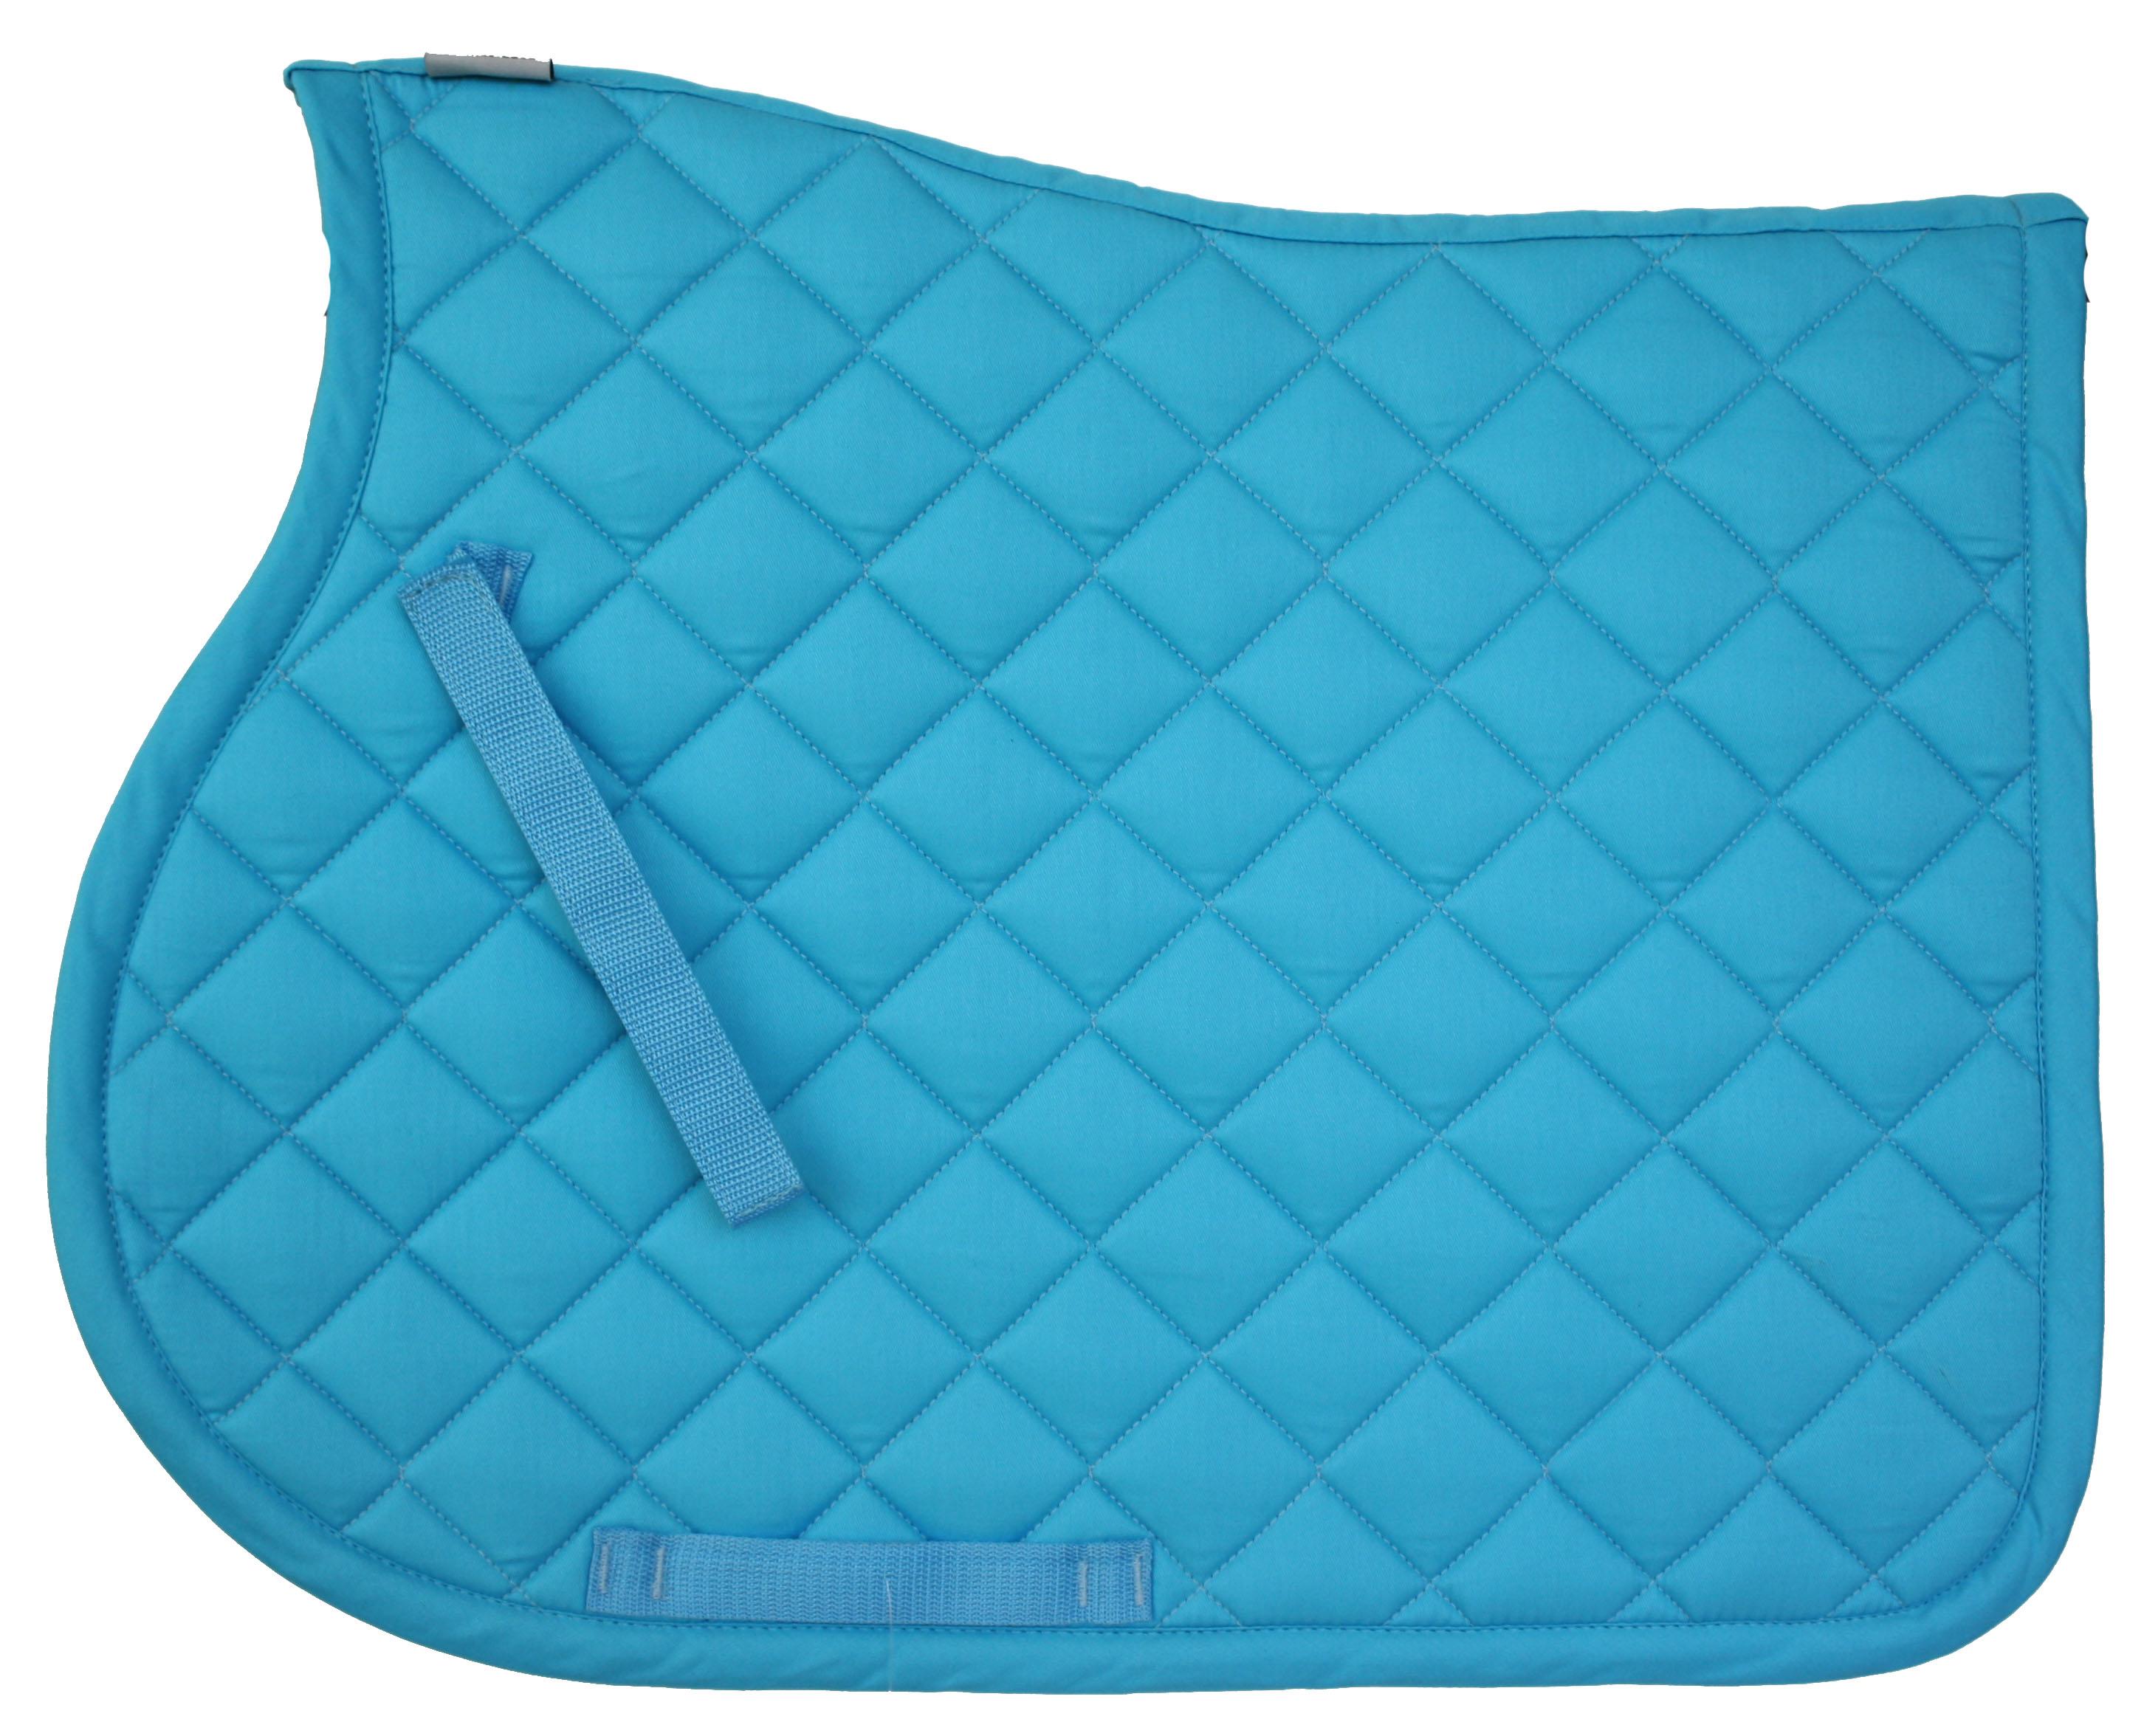 Lami-Cell All Purpose Saddle Pad